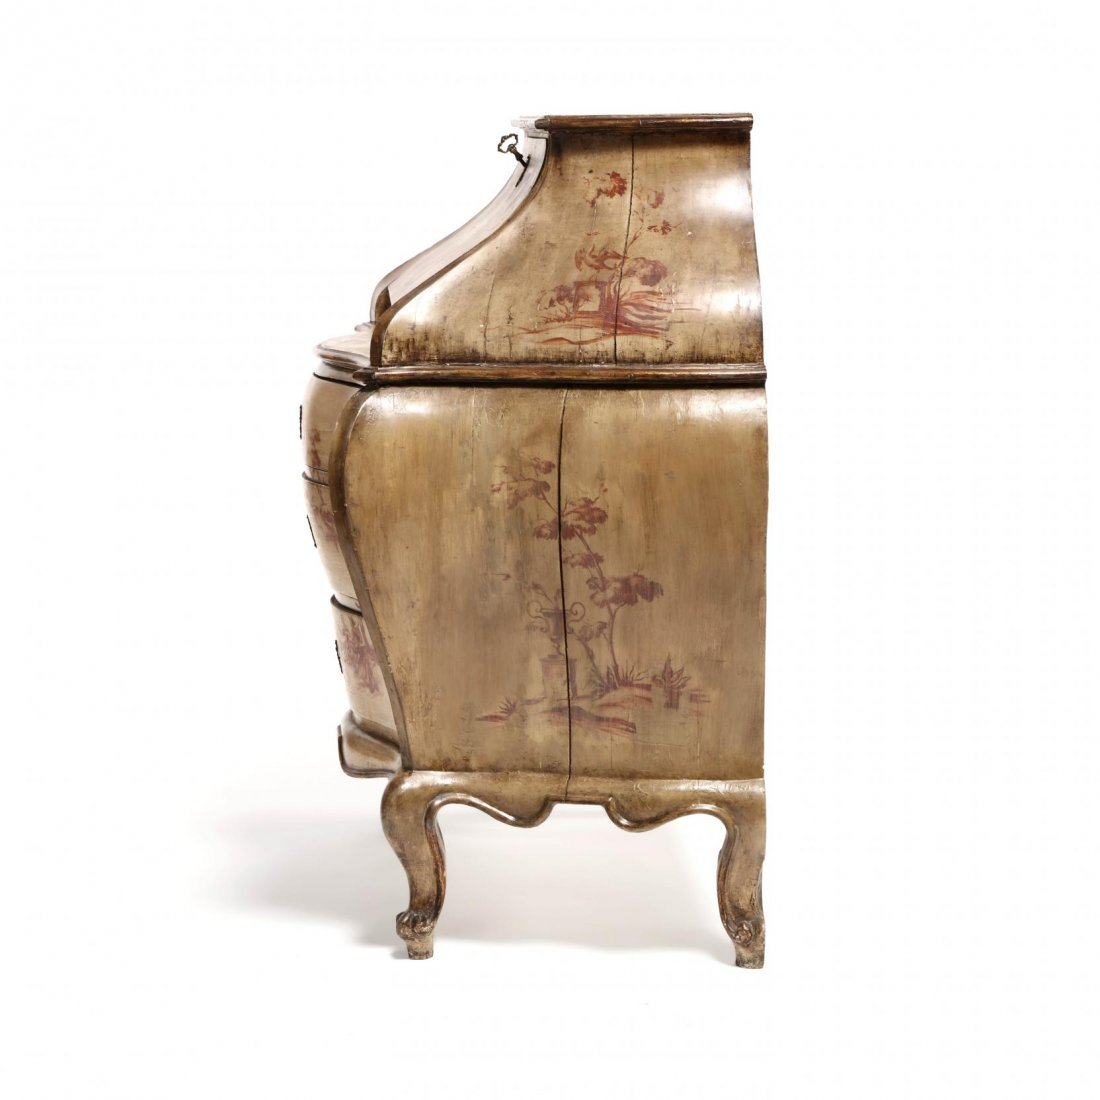 Italianate Polychrome Decorated Bombe Commode - 8